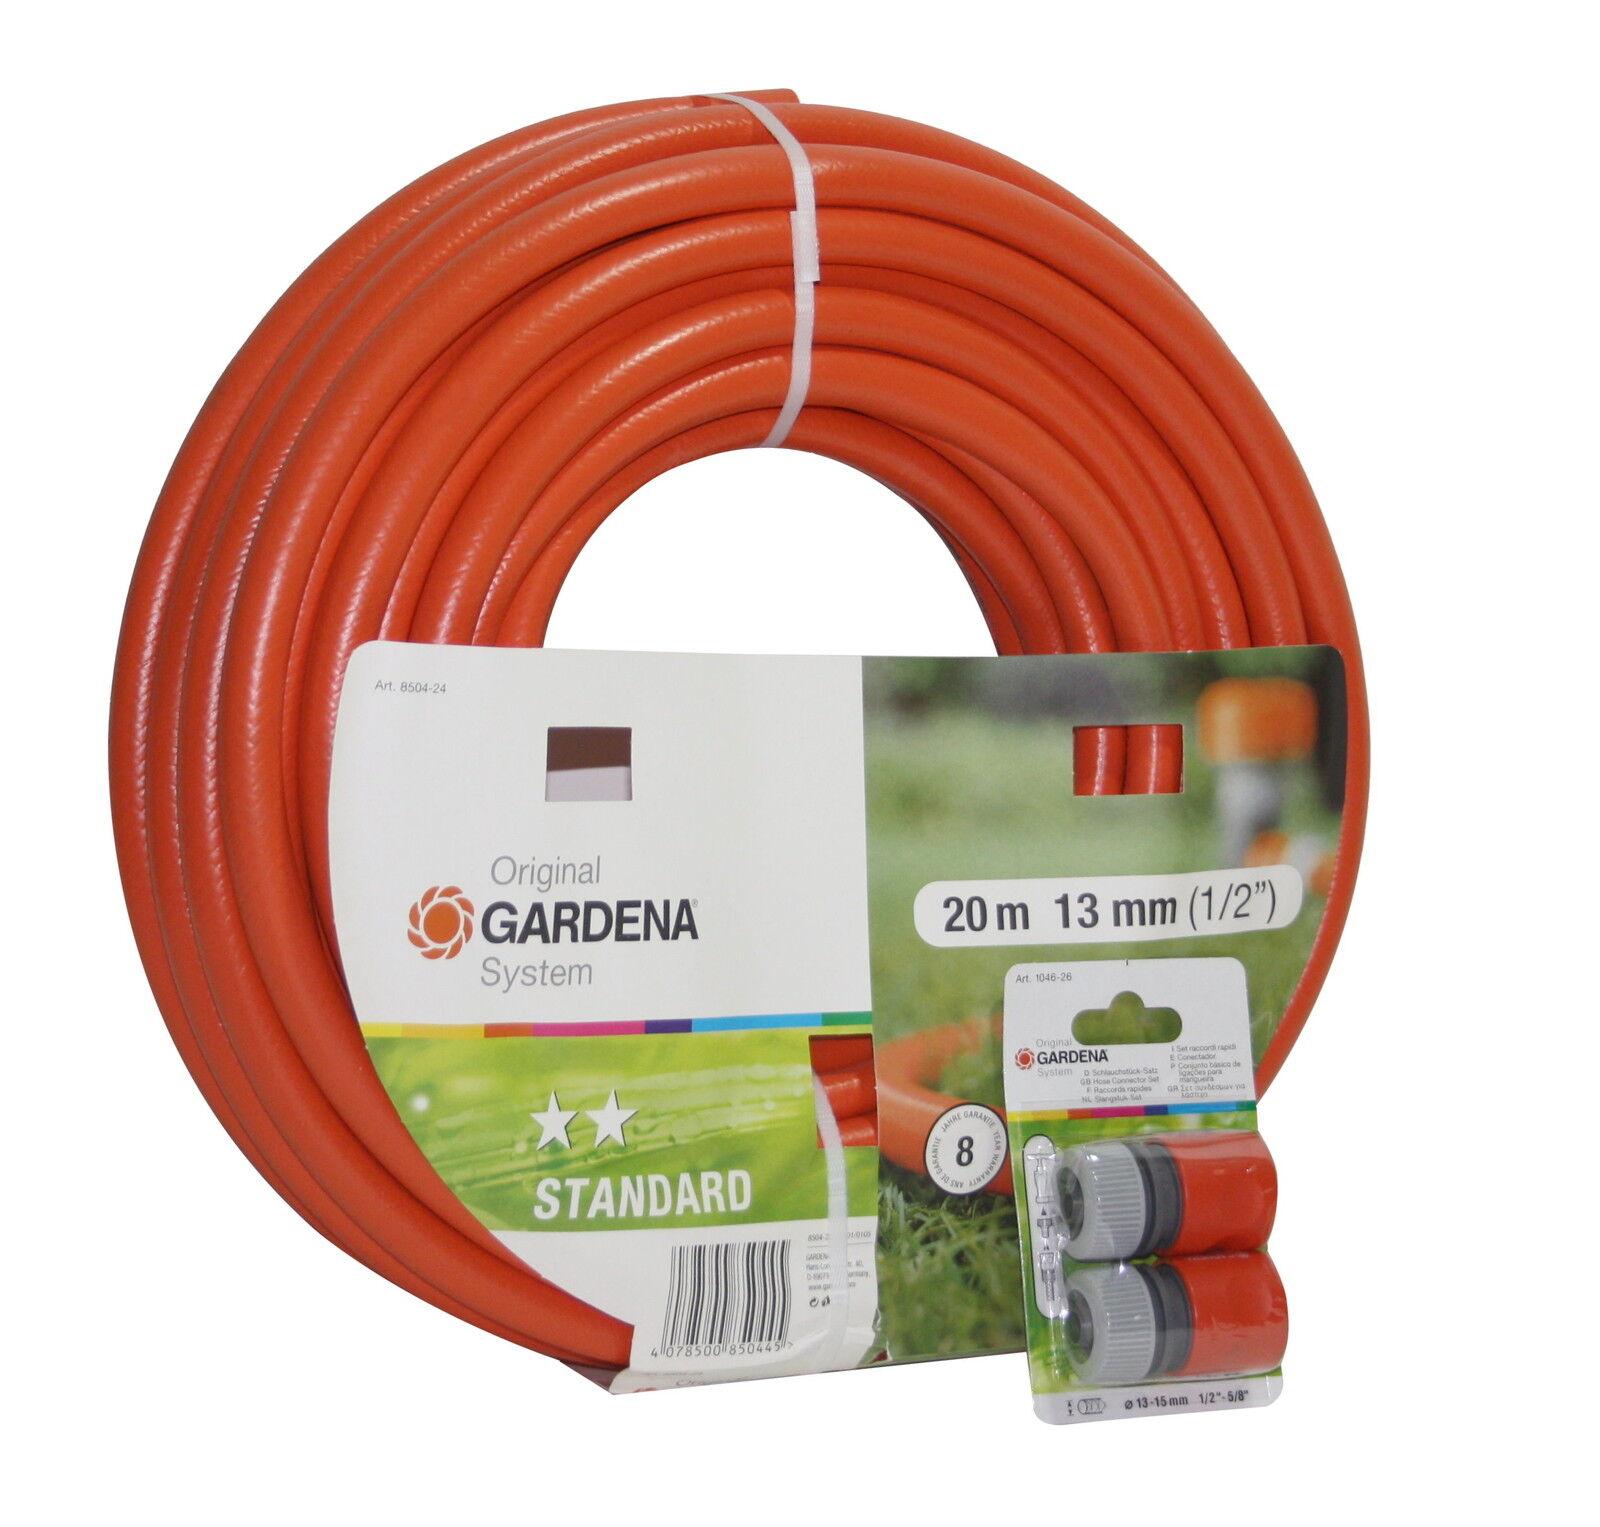 "Gardena Garten Schlauch 1/2"" 20m + 2x Schlauchstück Bewässerung Wasserschlauch"